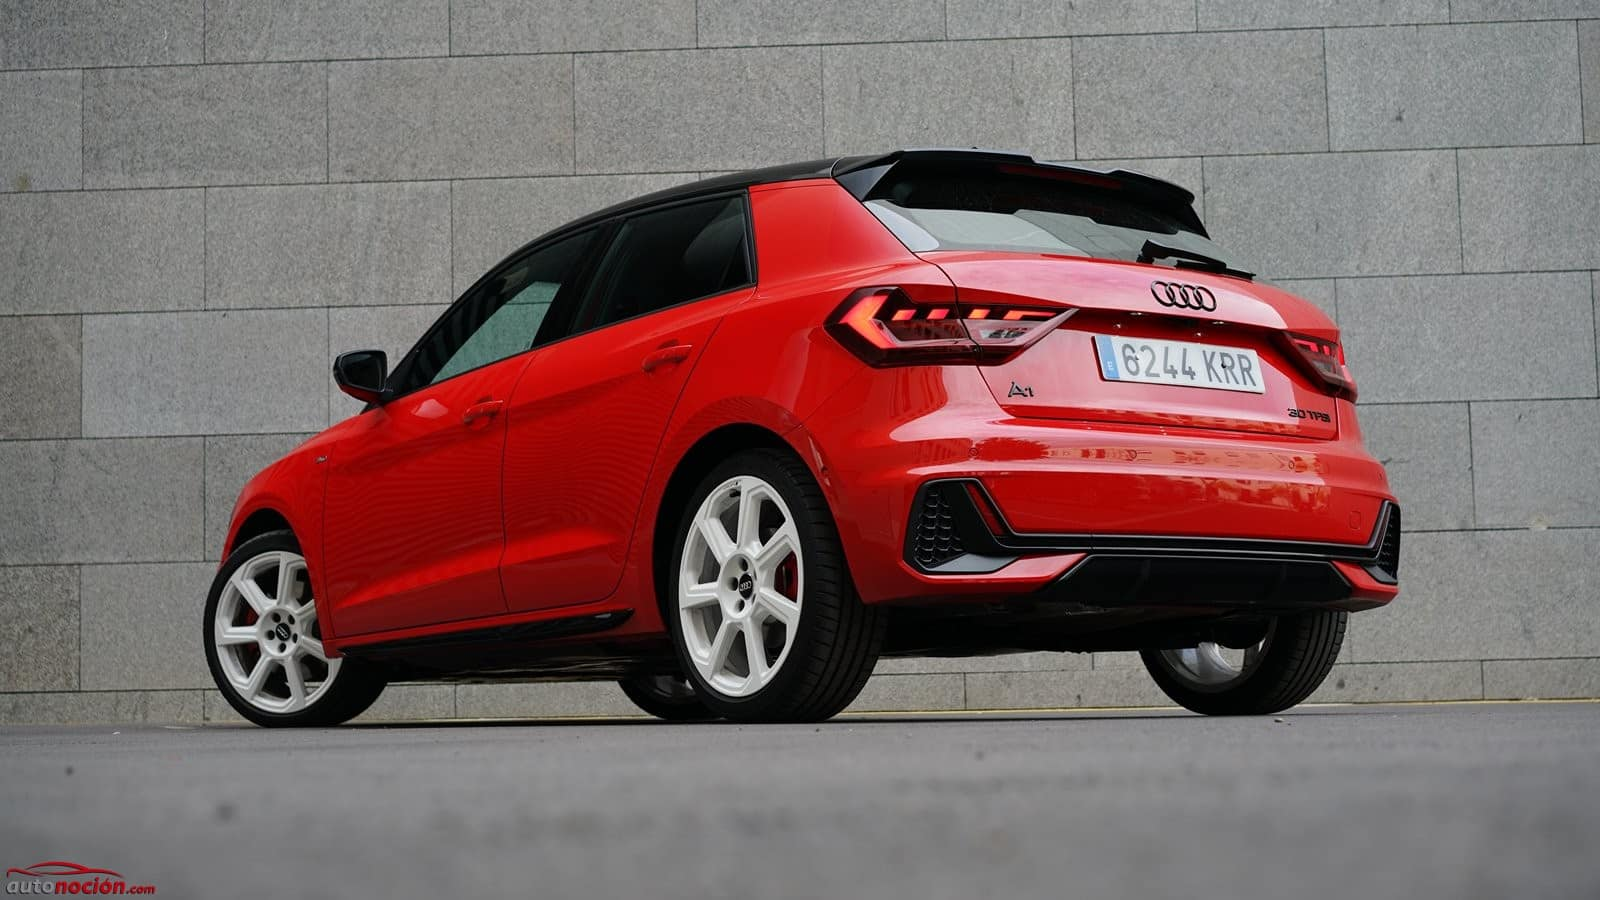 Opinion Y Prueba Audi A1 Sportback 30 Tfsi Precio Ofertas